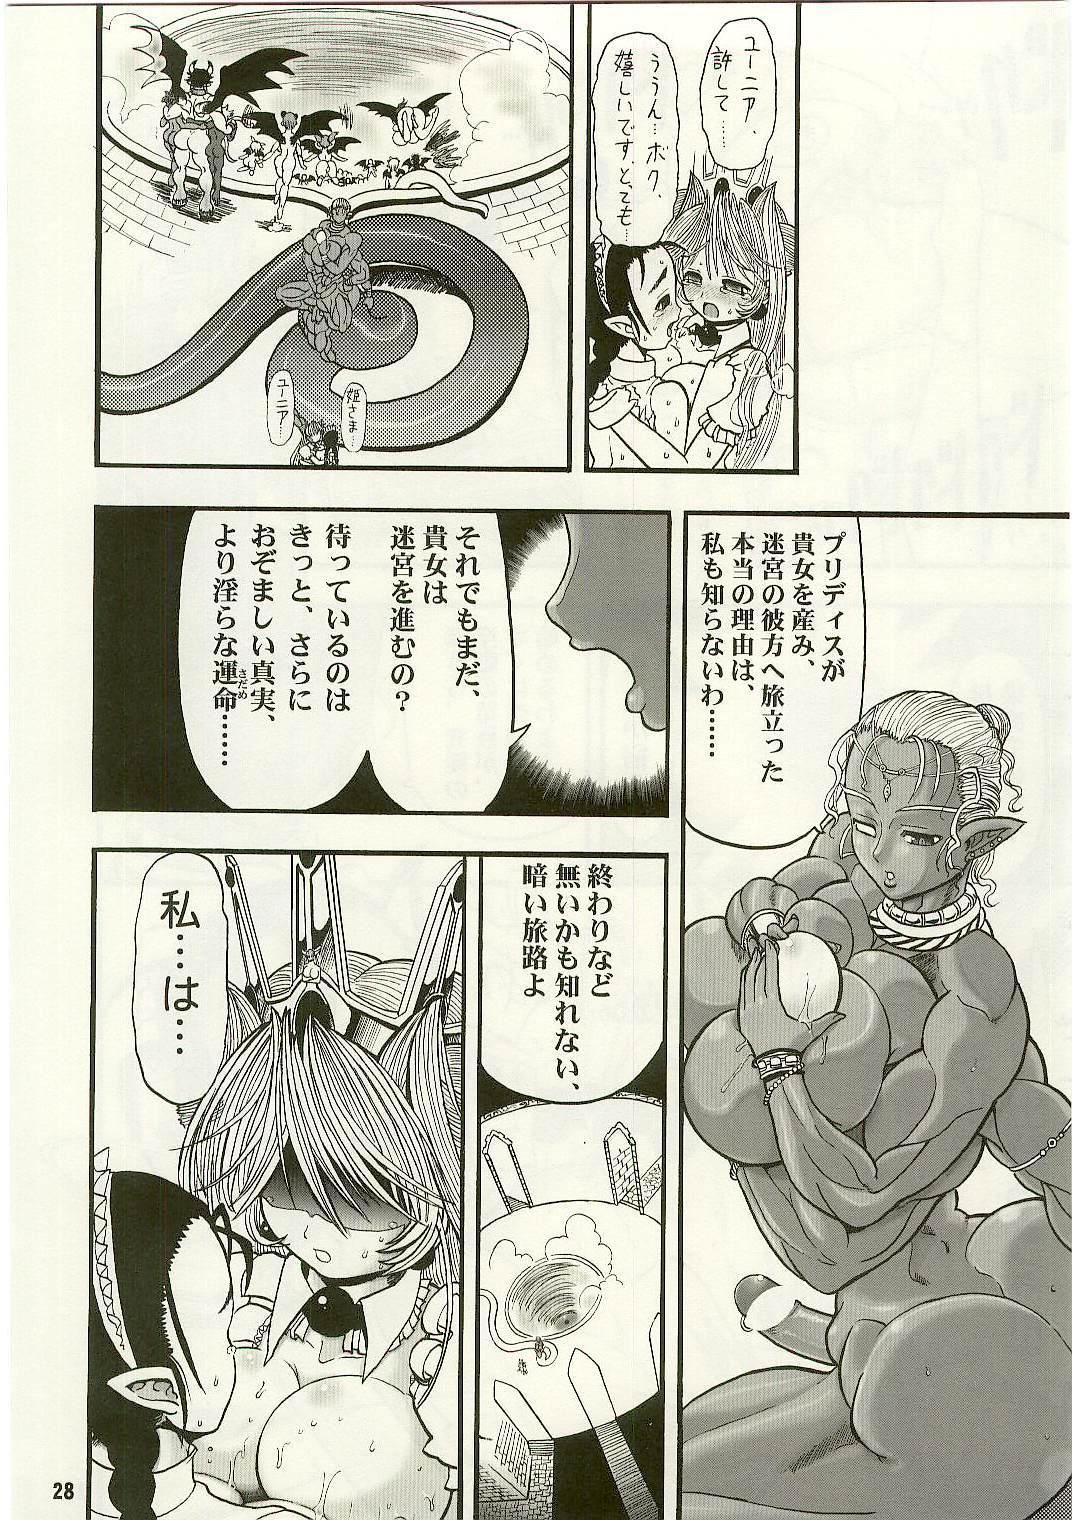 TGWOA Vol.17 - Meikyuu Oujo Prina 3 25